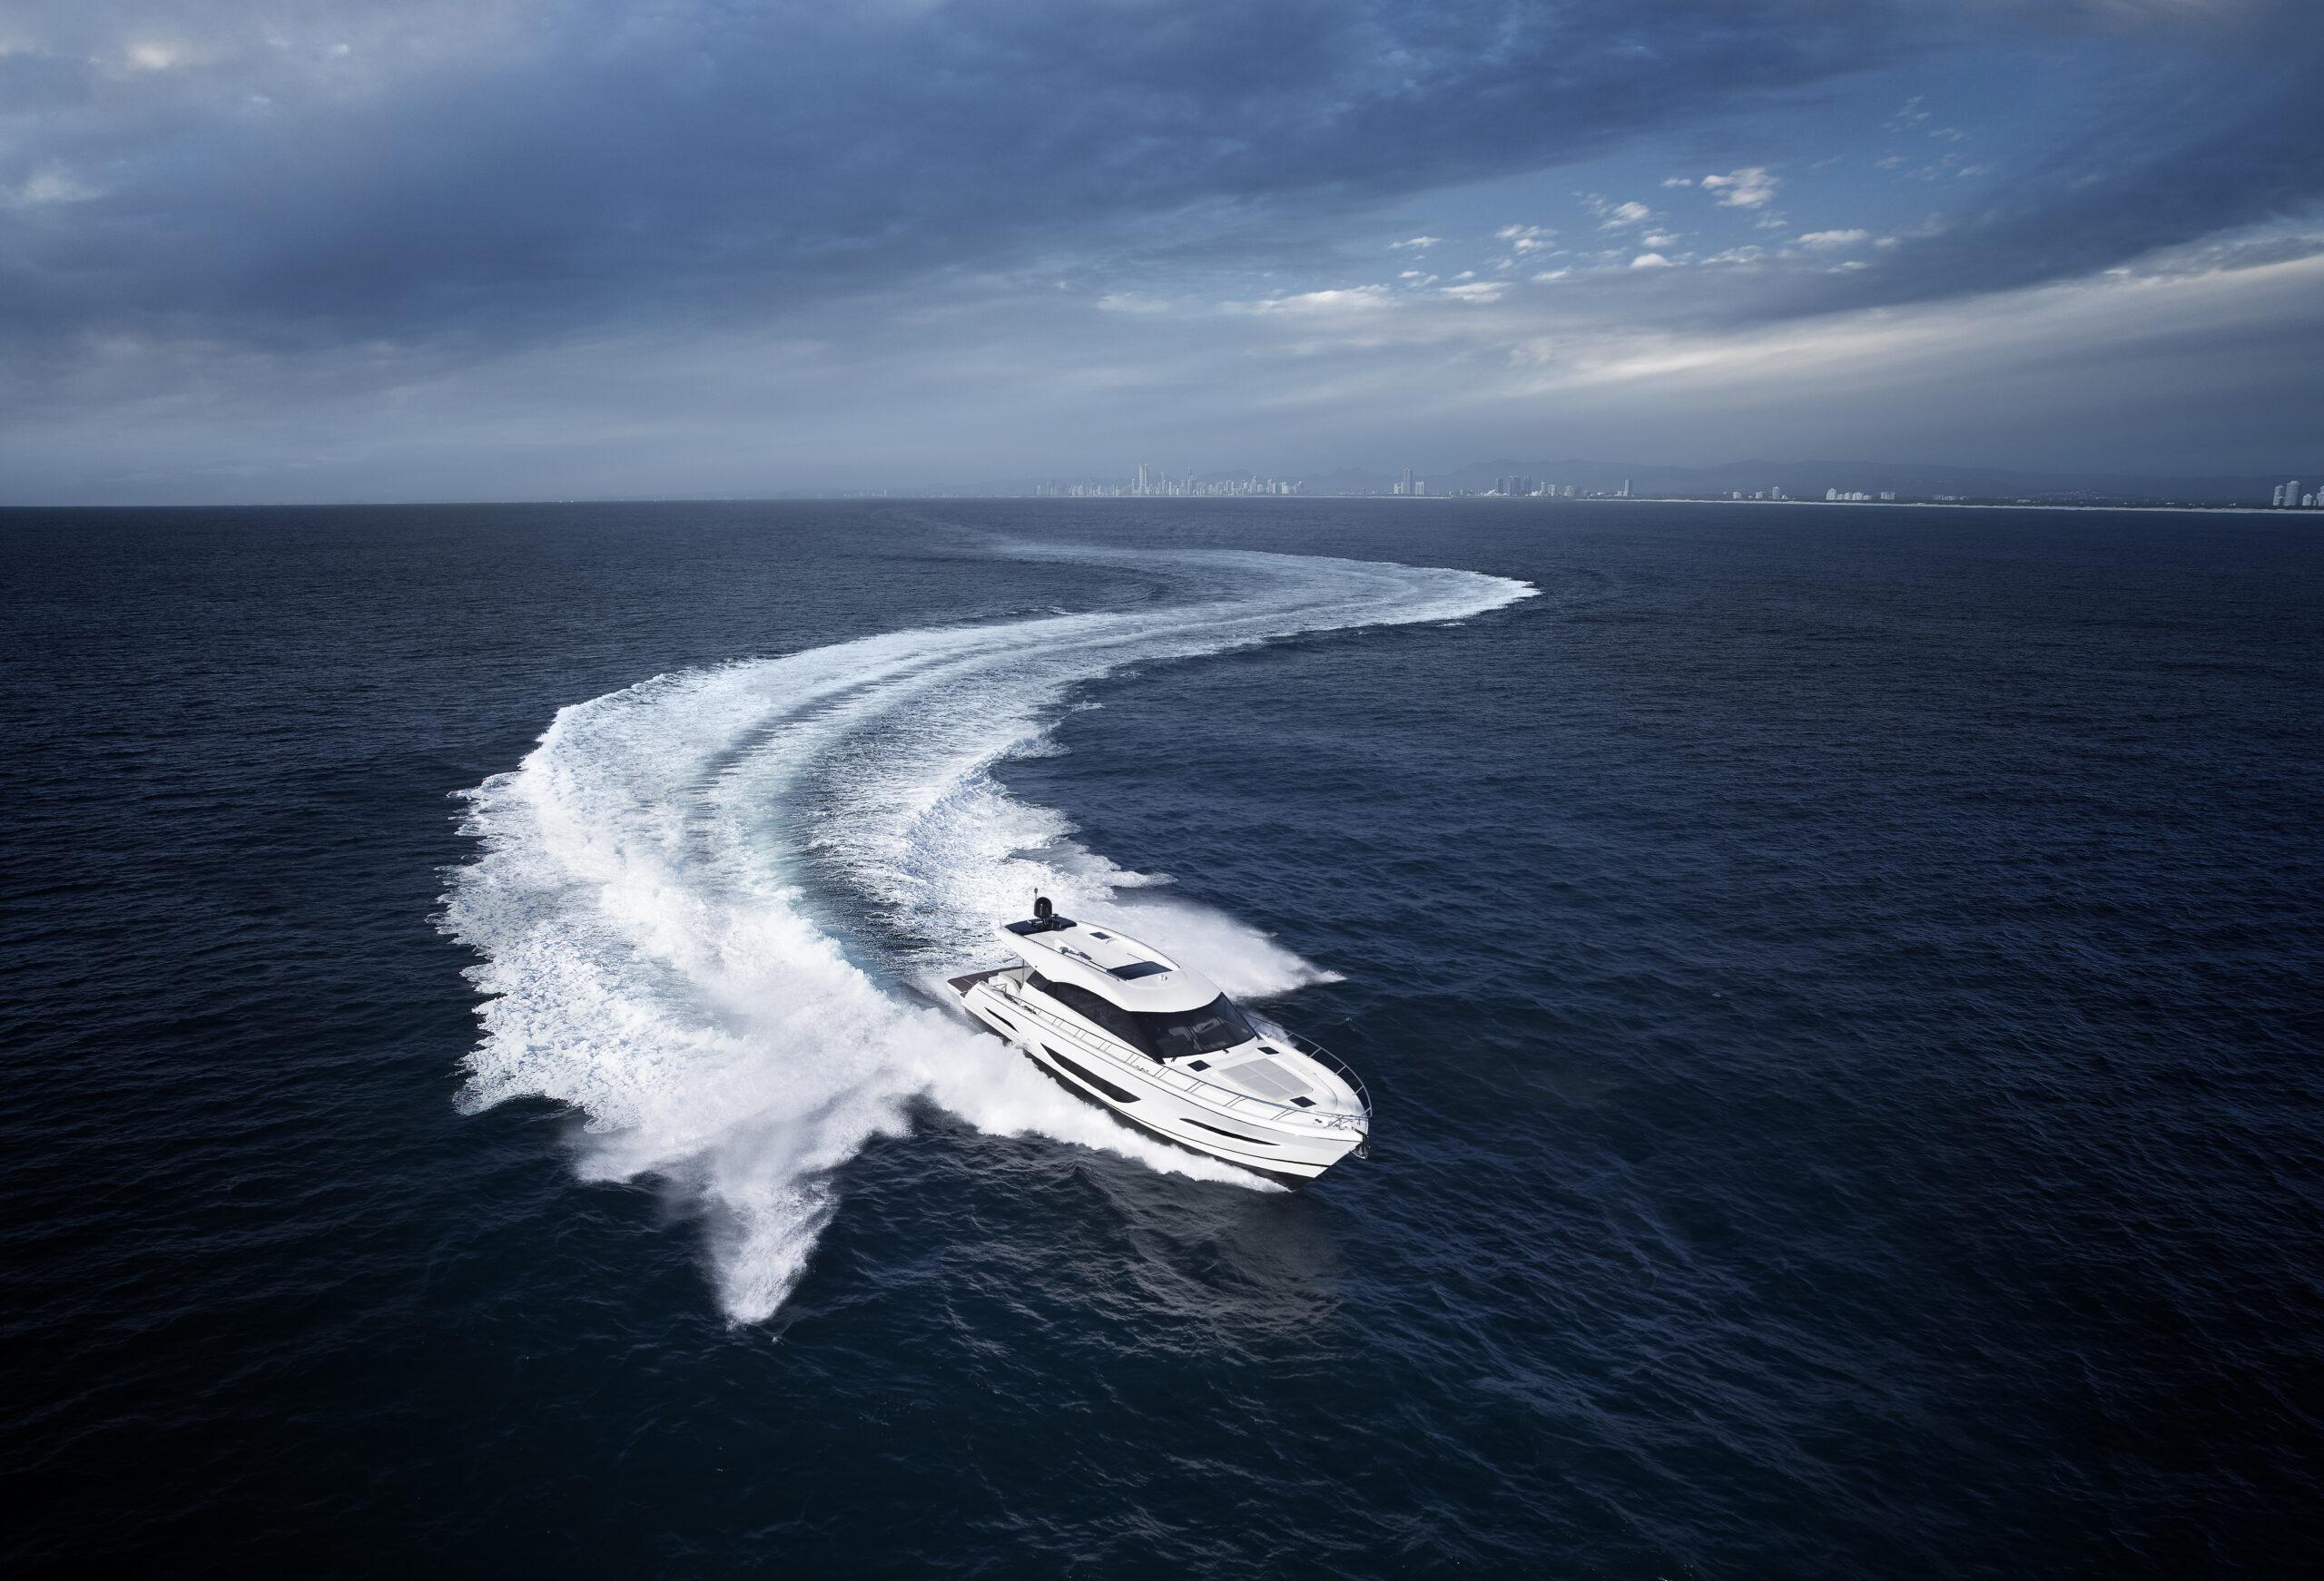 Maritimo S55 cruising in a snaking pattern